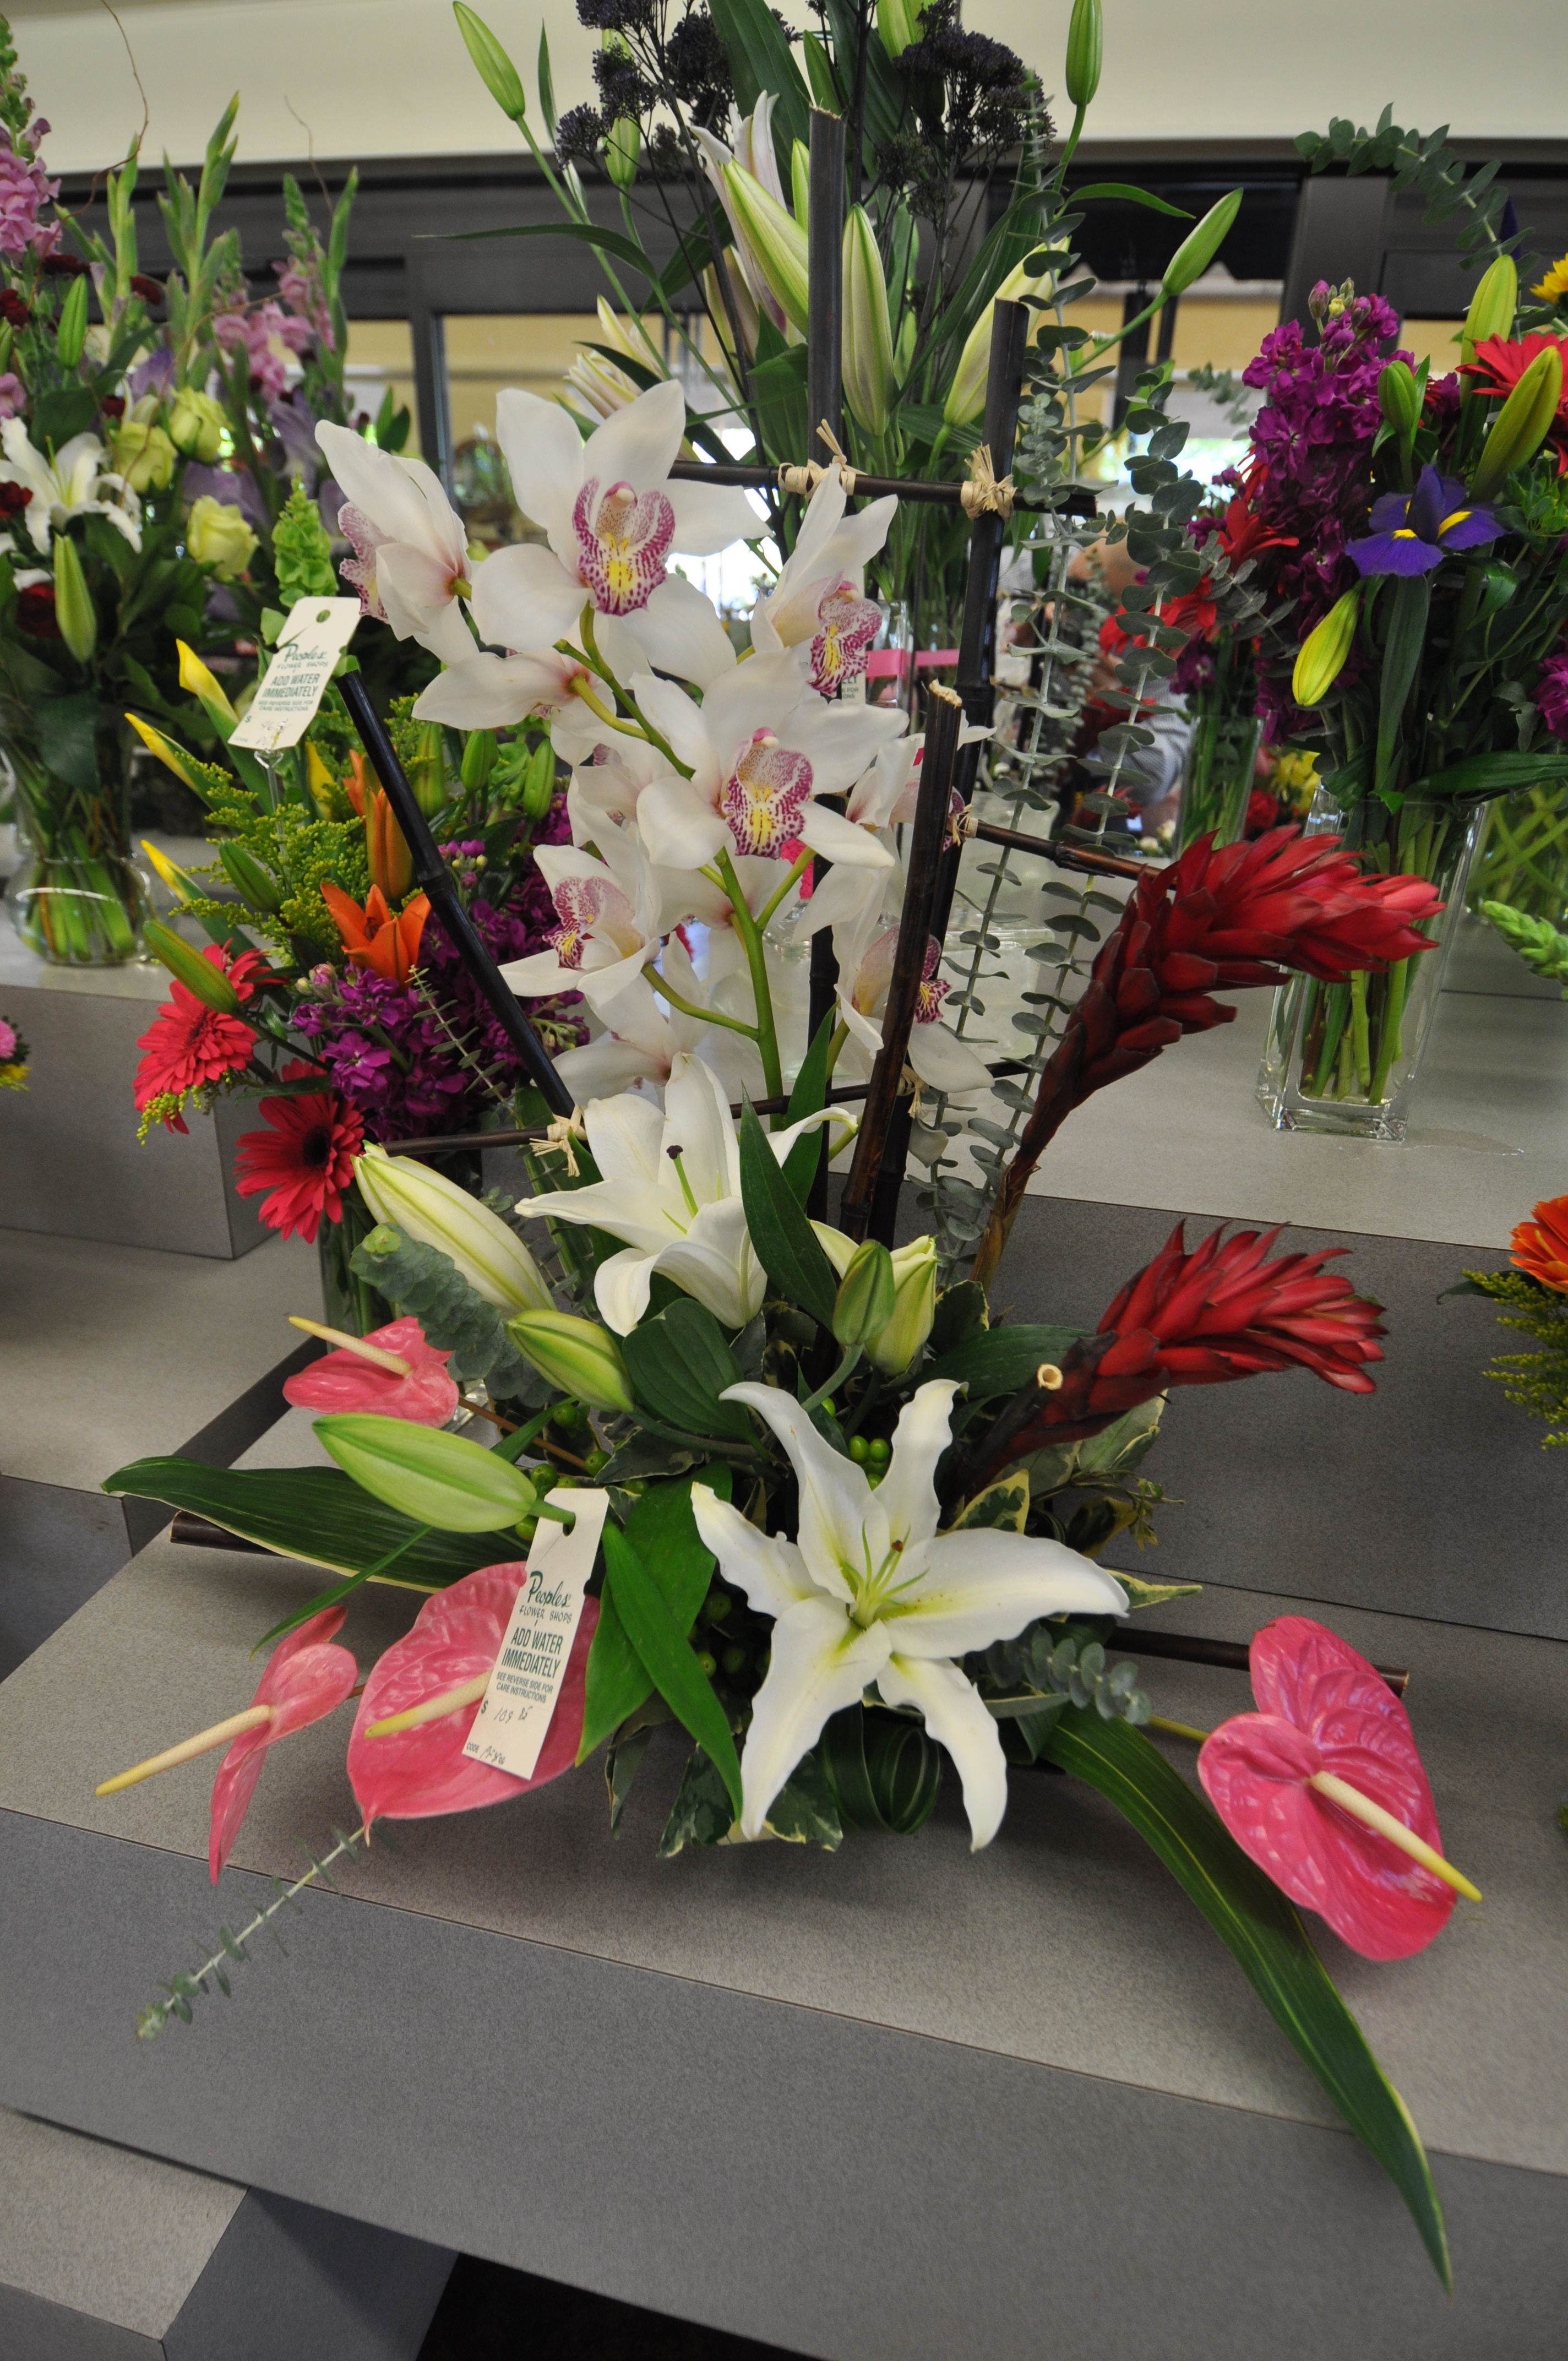 Peoples Flower Shops Main Location Albuquerque New Mexico NM LocalDataba